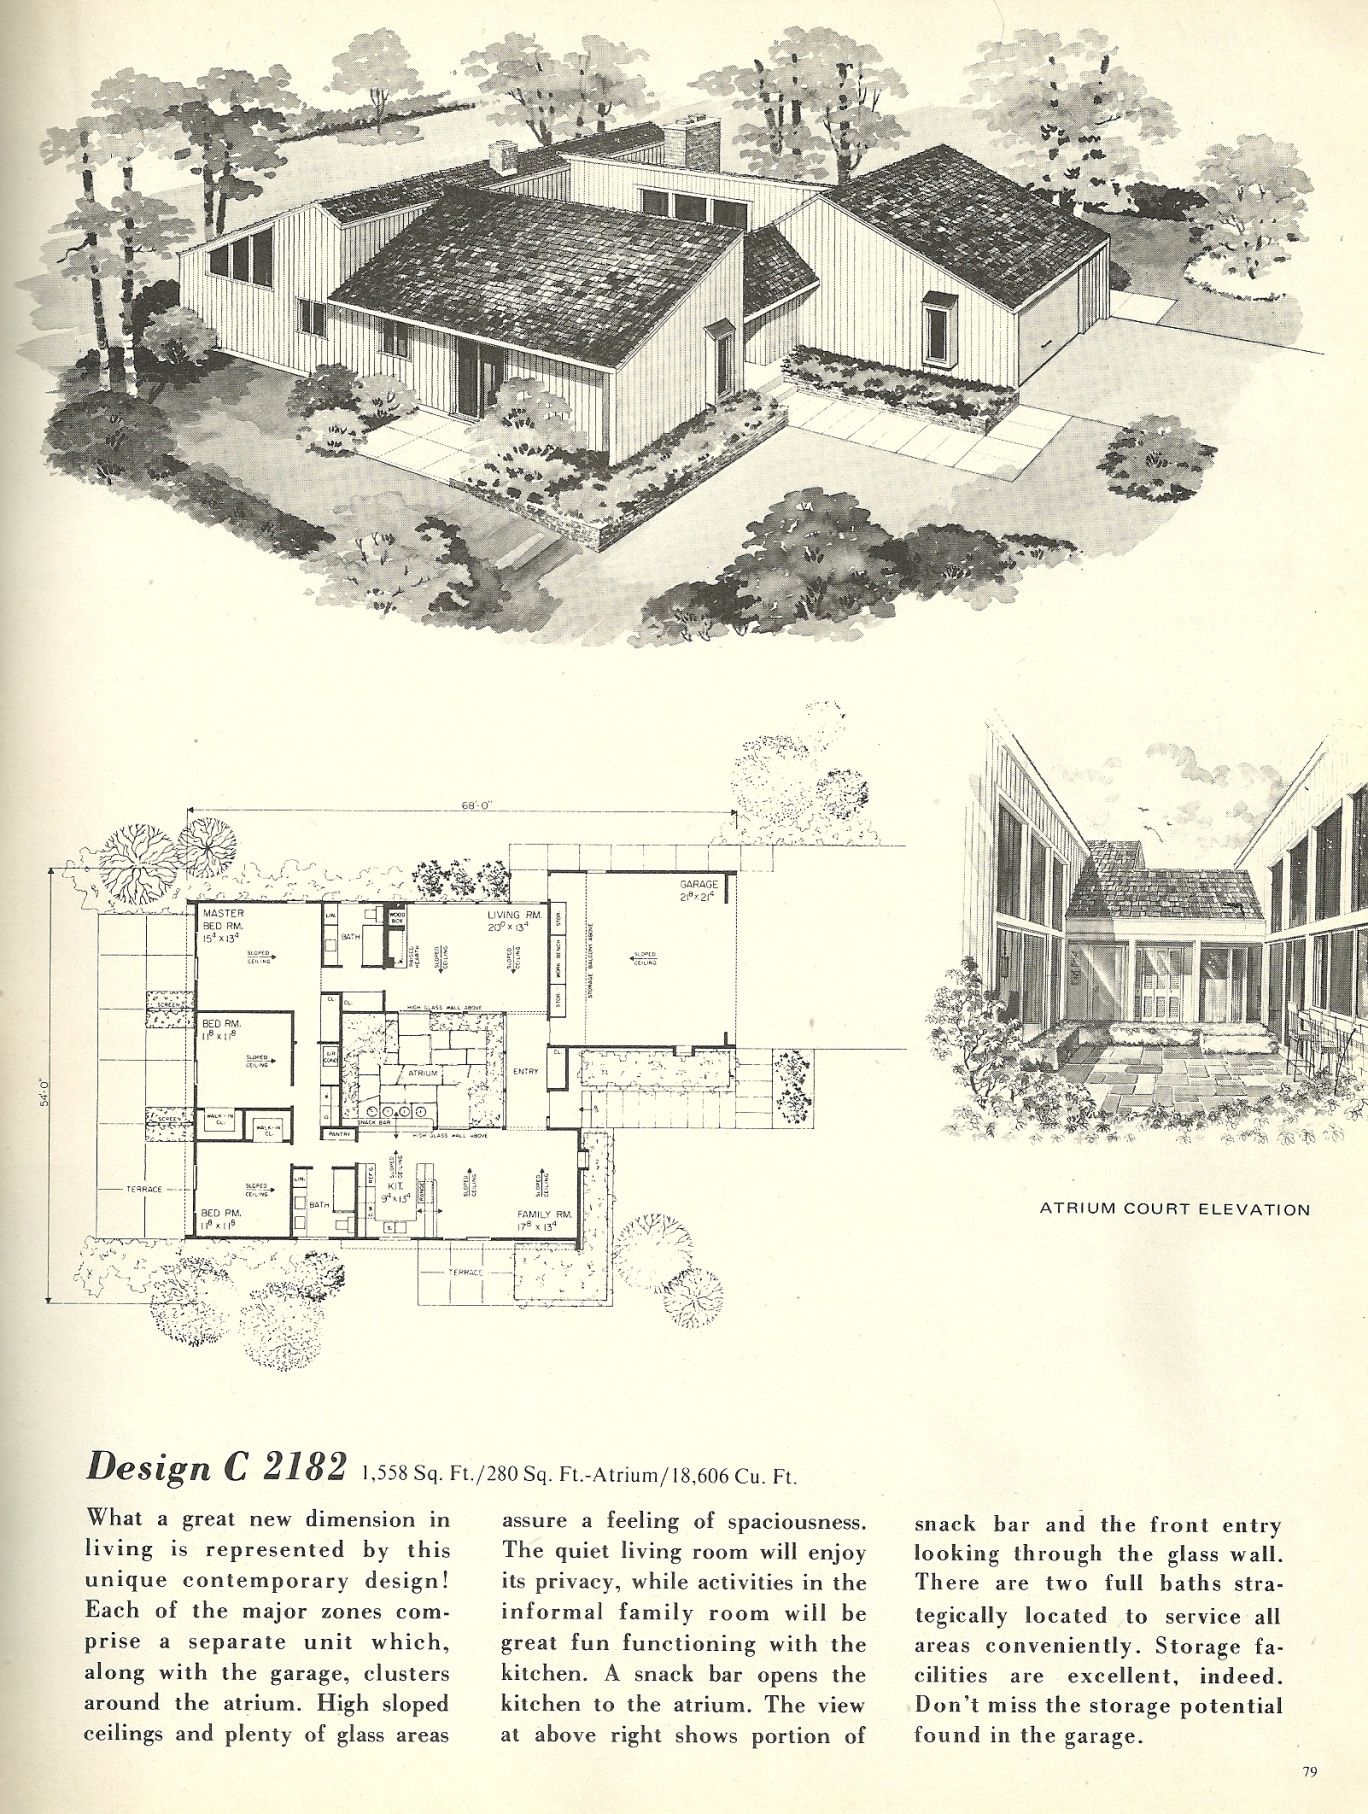 Vintage House Plans 2182 Mid century modern house plans